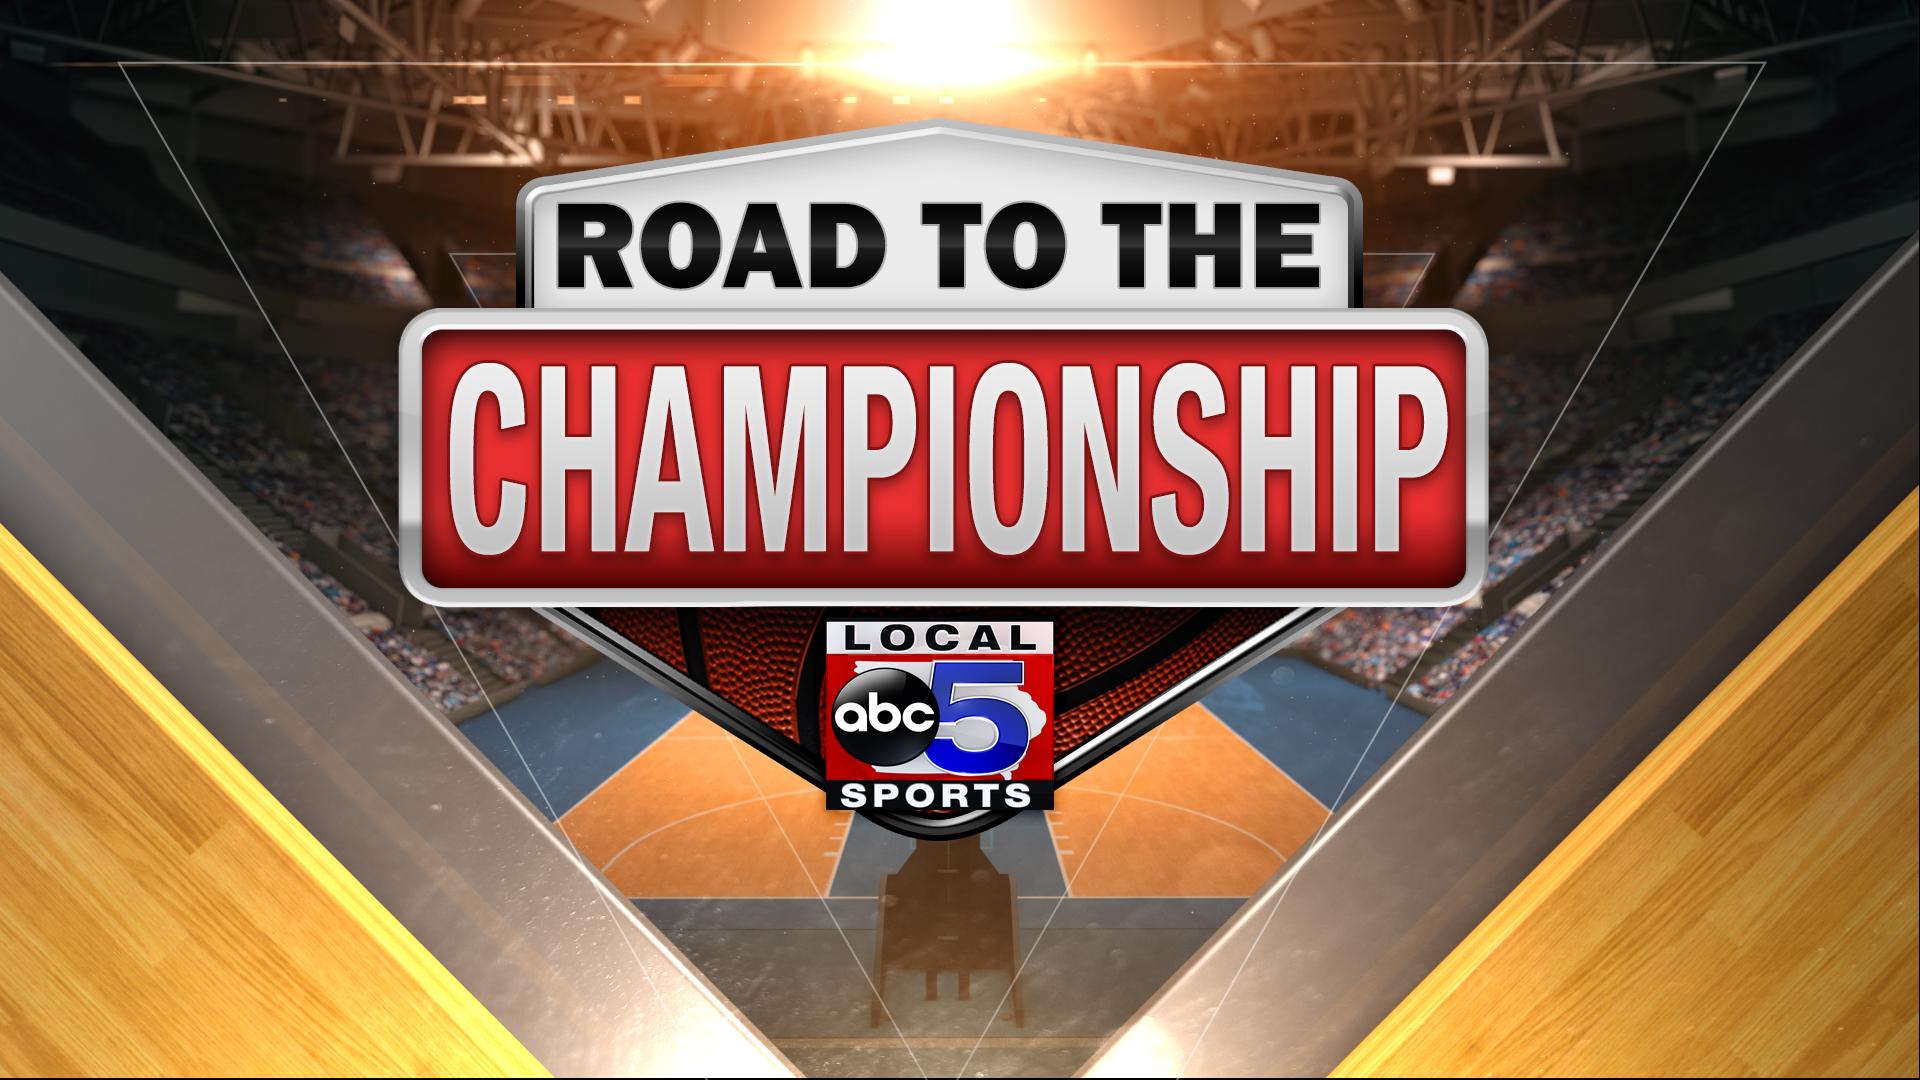 Road to the Championship Local 5 STILL_1552328757890.jpg-54710709.jpg